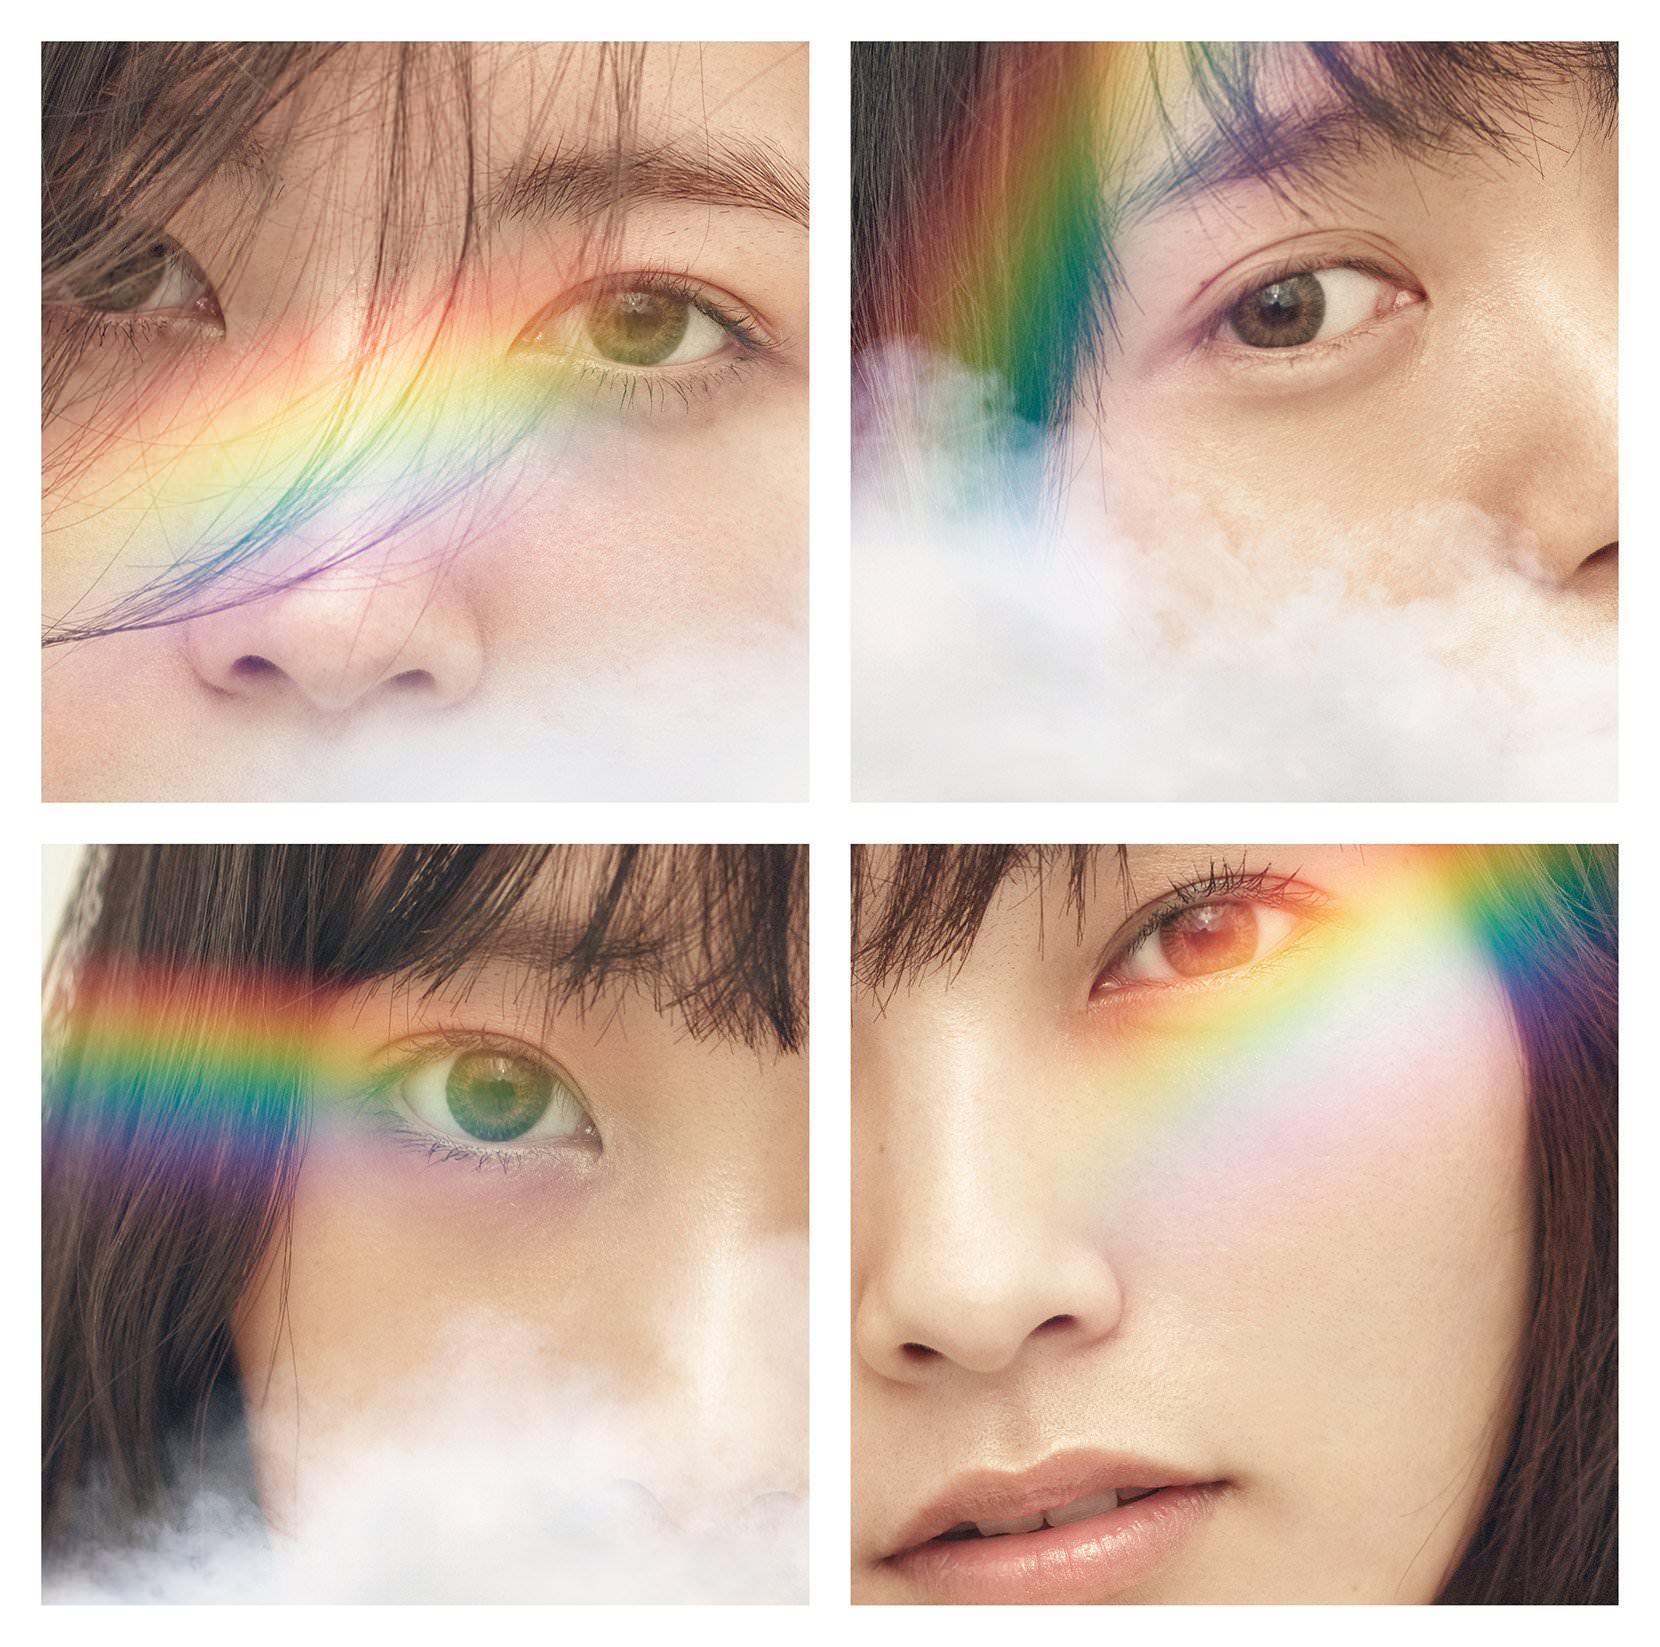 20180810.0048.12 AKB48 - 11gatsu no Anklet (Type E) (DVD) (JPOP.ru) cover 10.jpg